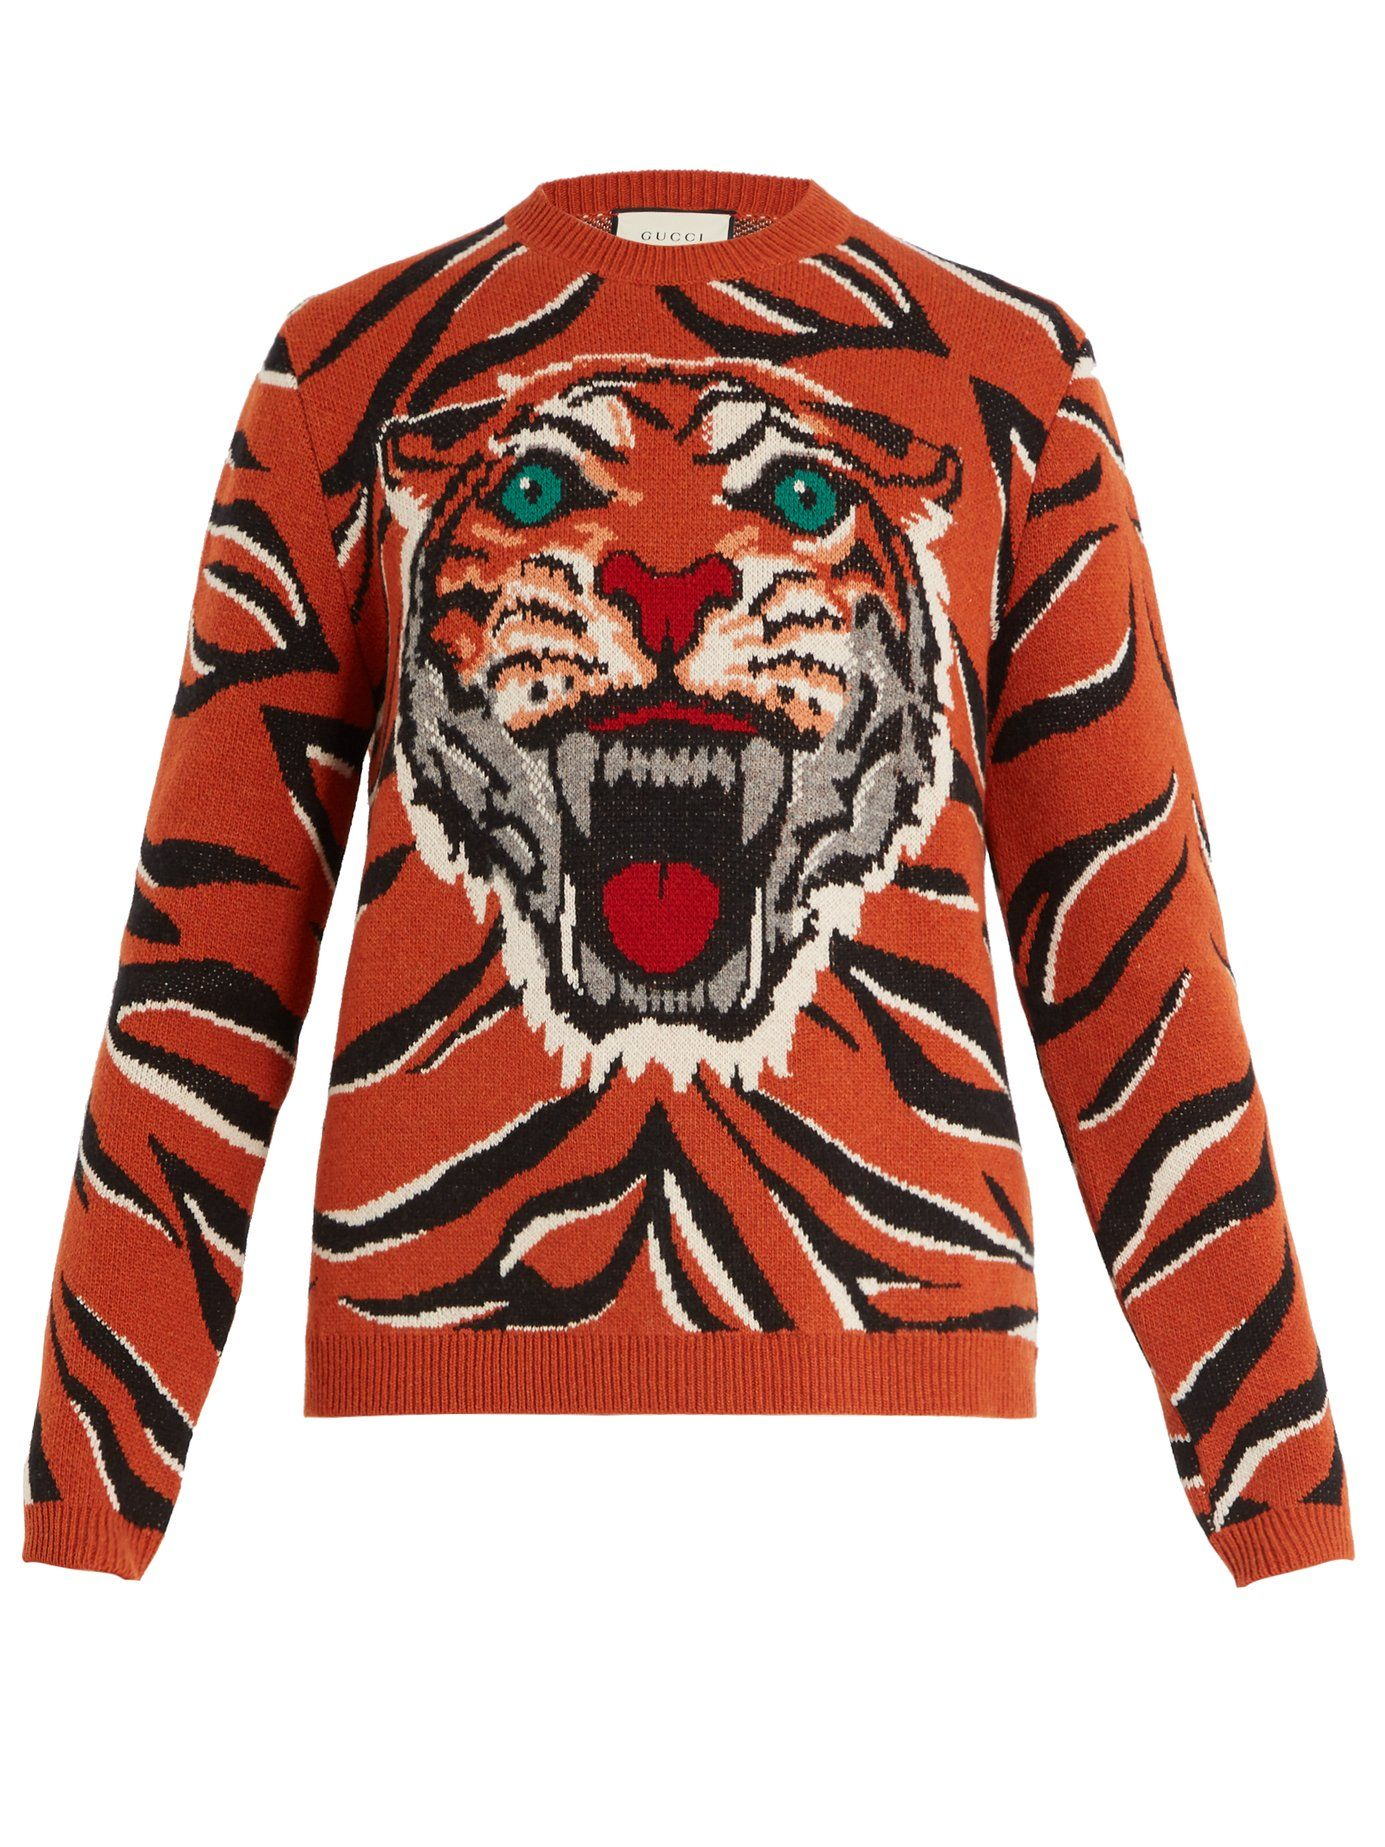 Tiger Intarsia Knit Wool Sweater Gucci Matchesfashion Com Mens Designer Sweaters Gucci Menswear Gucci Sweater [ 1847 x 1385 Pixel ]